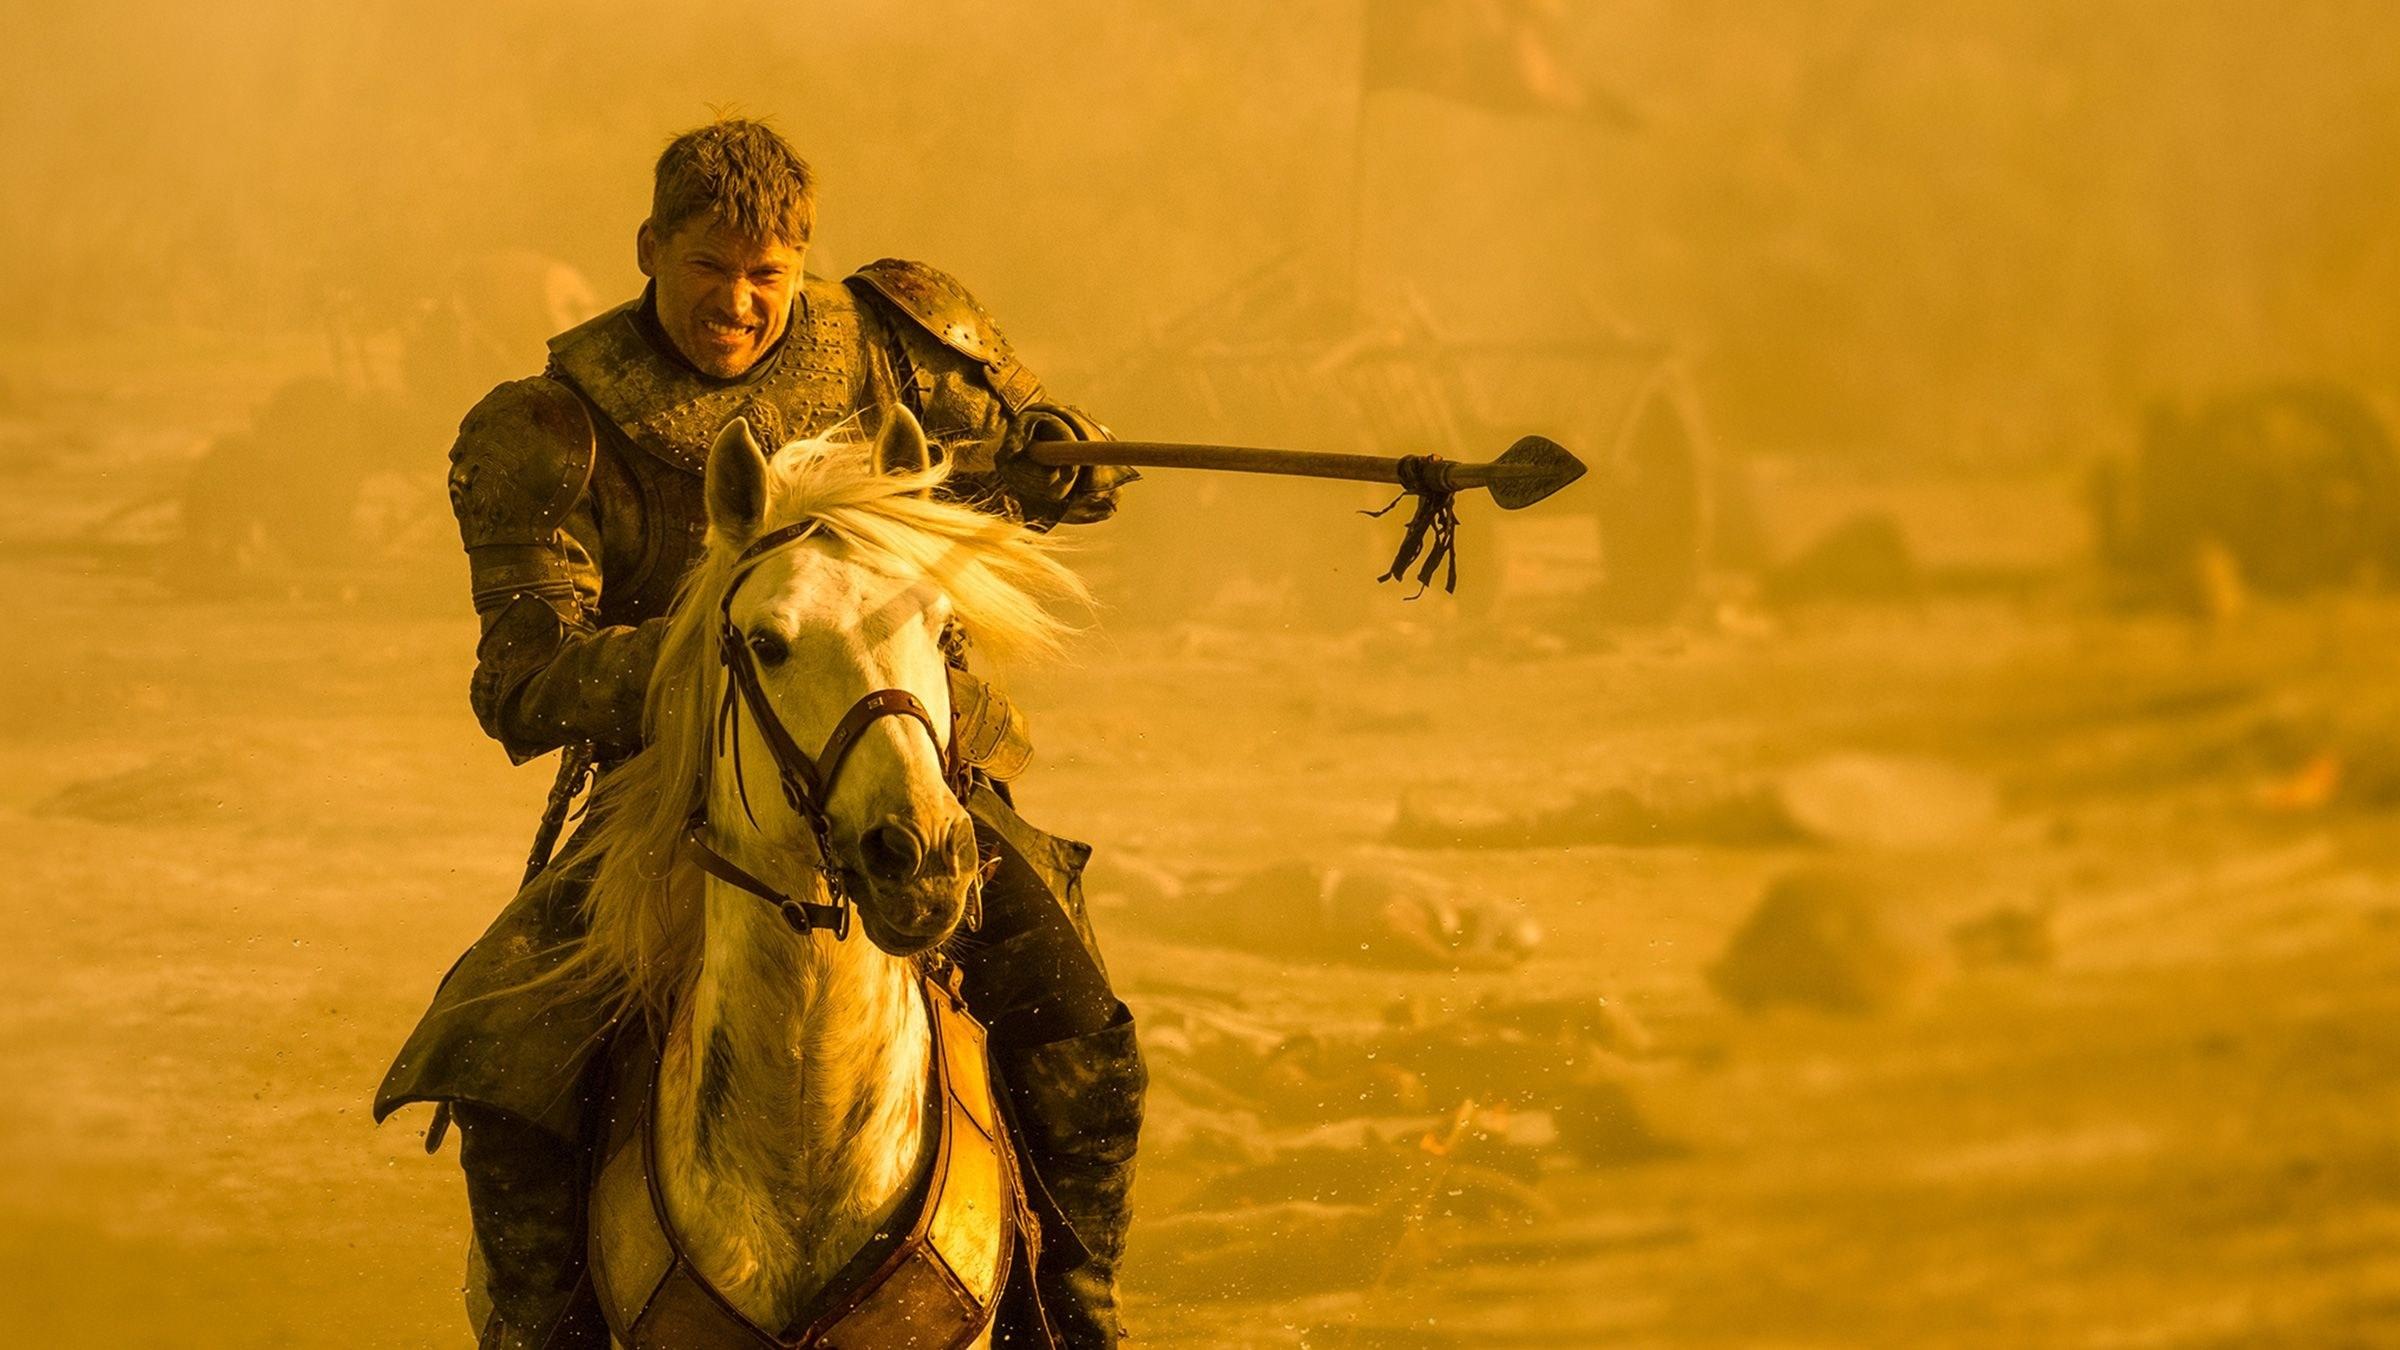 jaime lannister rides a horse in the desert